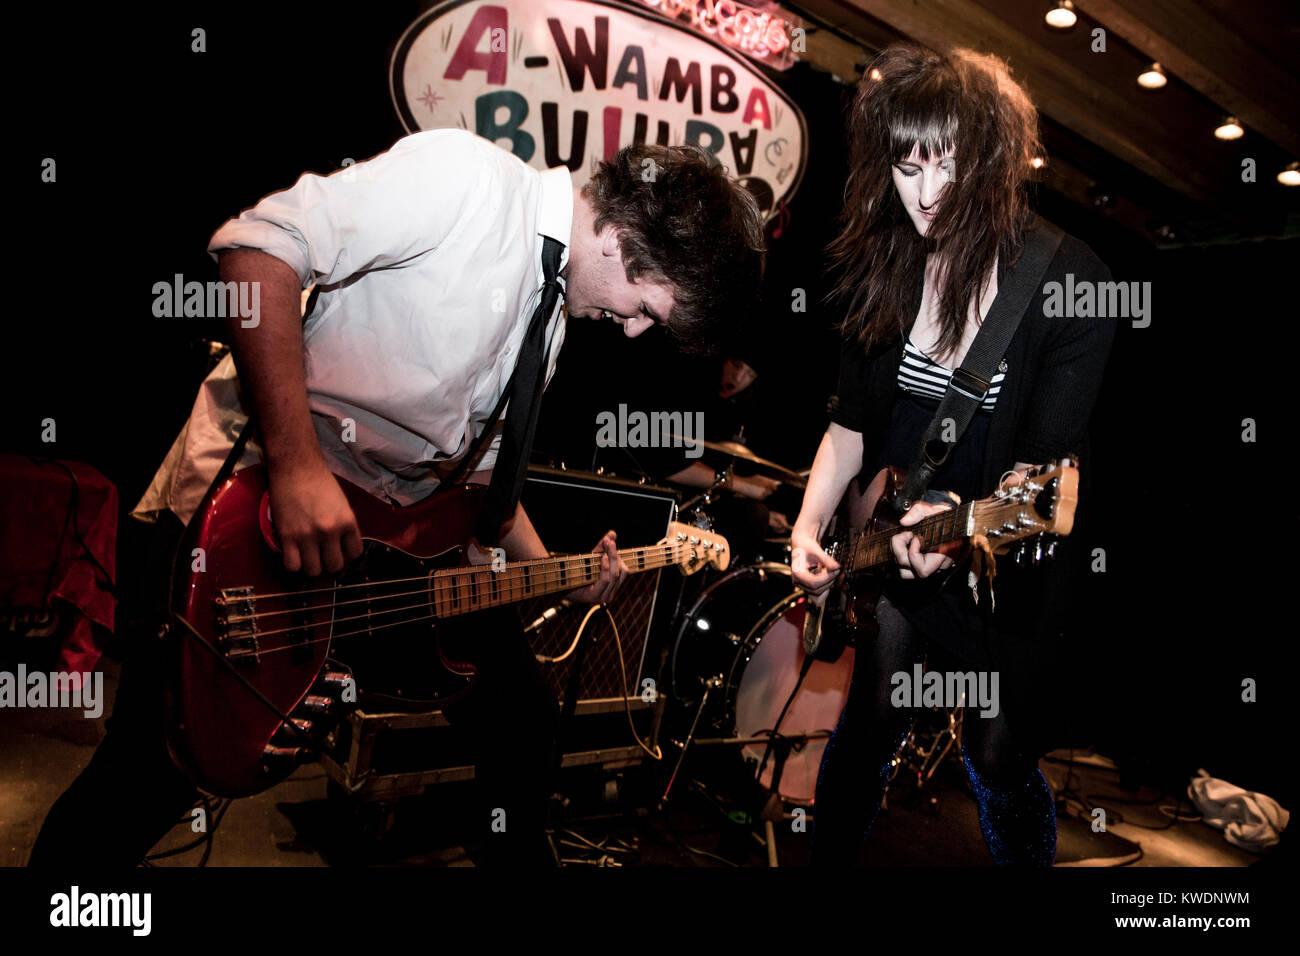 Barcelona, Spain. October 02, 2017. Concert by Ming City Rockers in Marula Café. Organized by A Wamba Buluba. - Stock Image